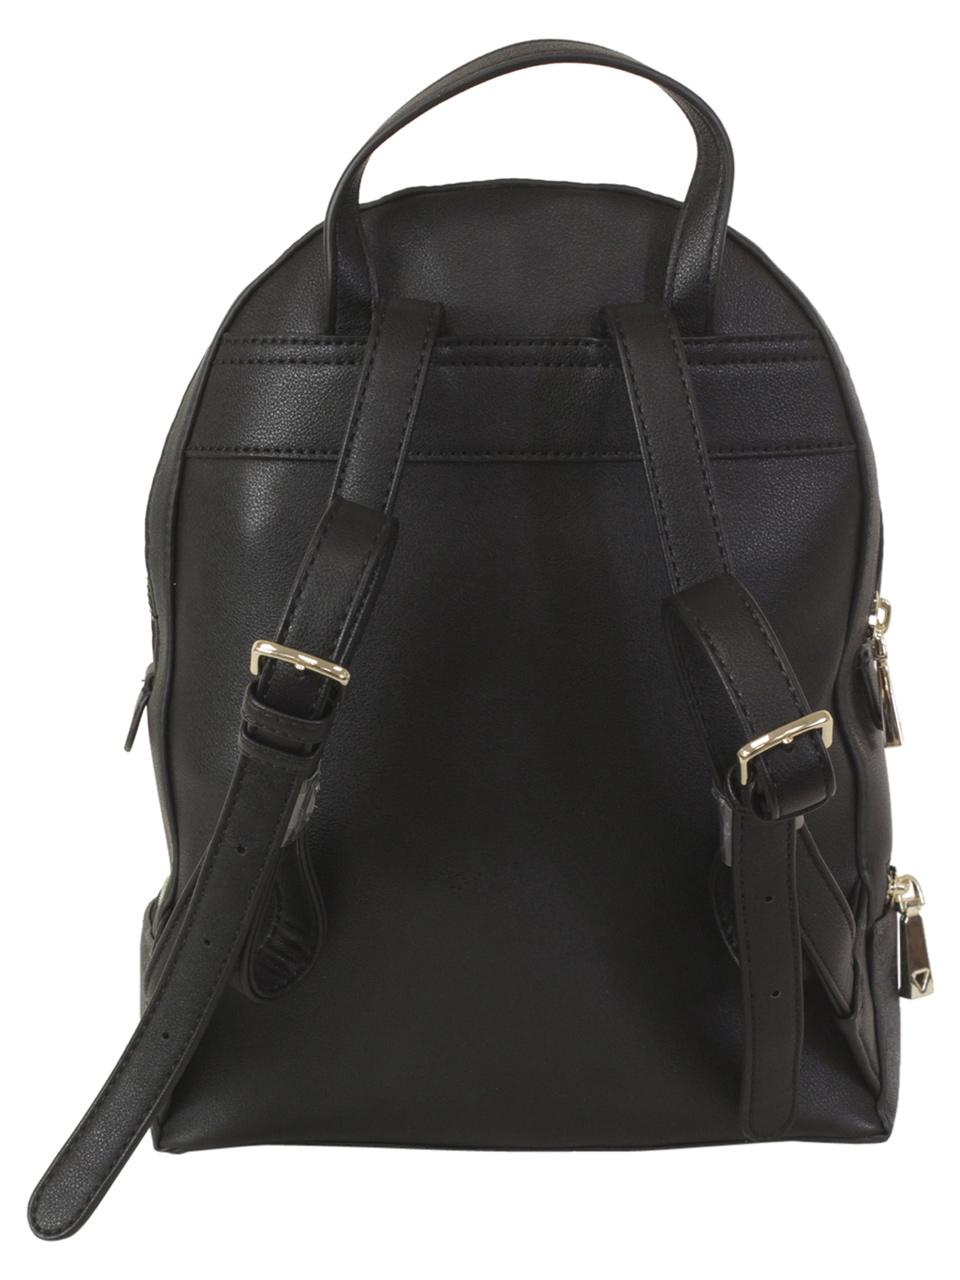 Guess-Women-039-s-Skye-Large-Backpack-Bag thumbnail 13